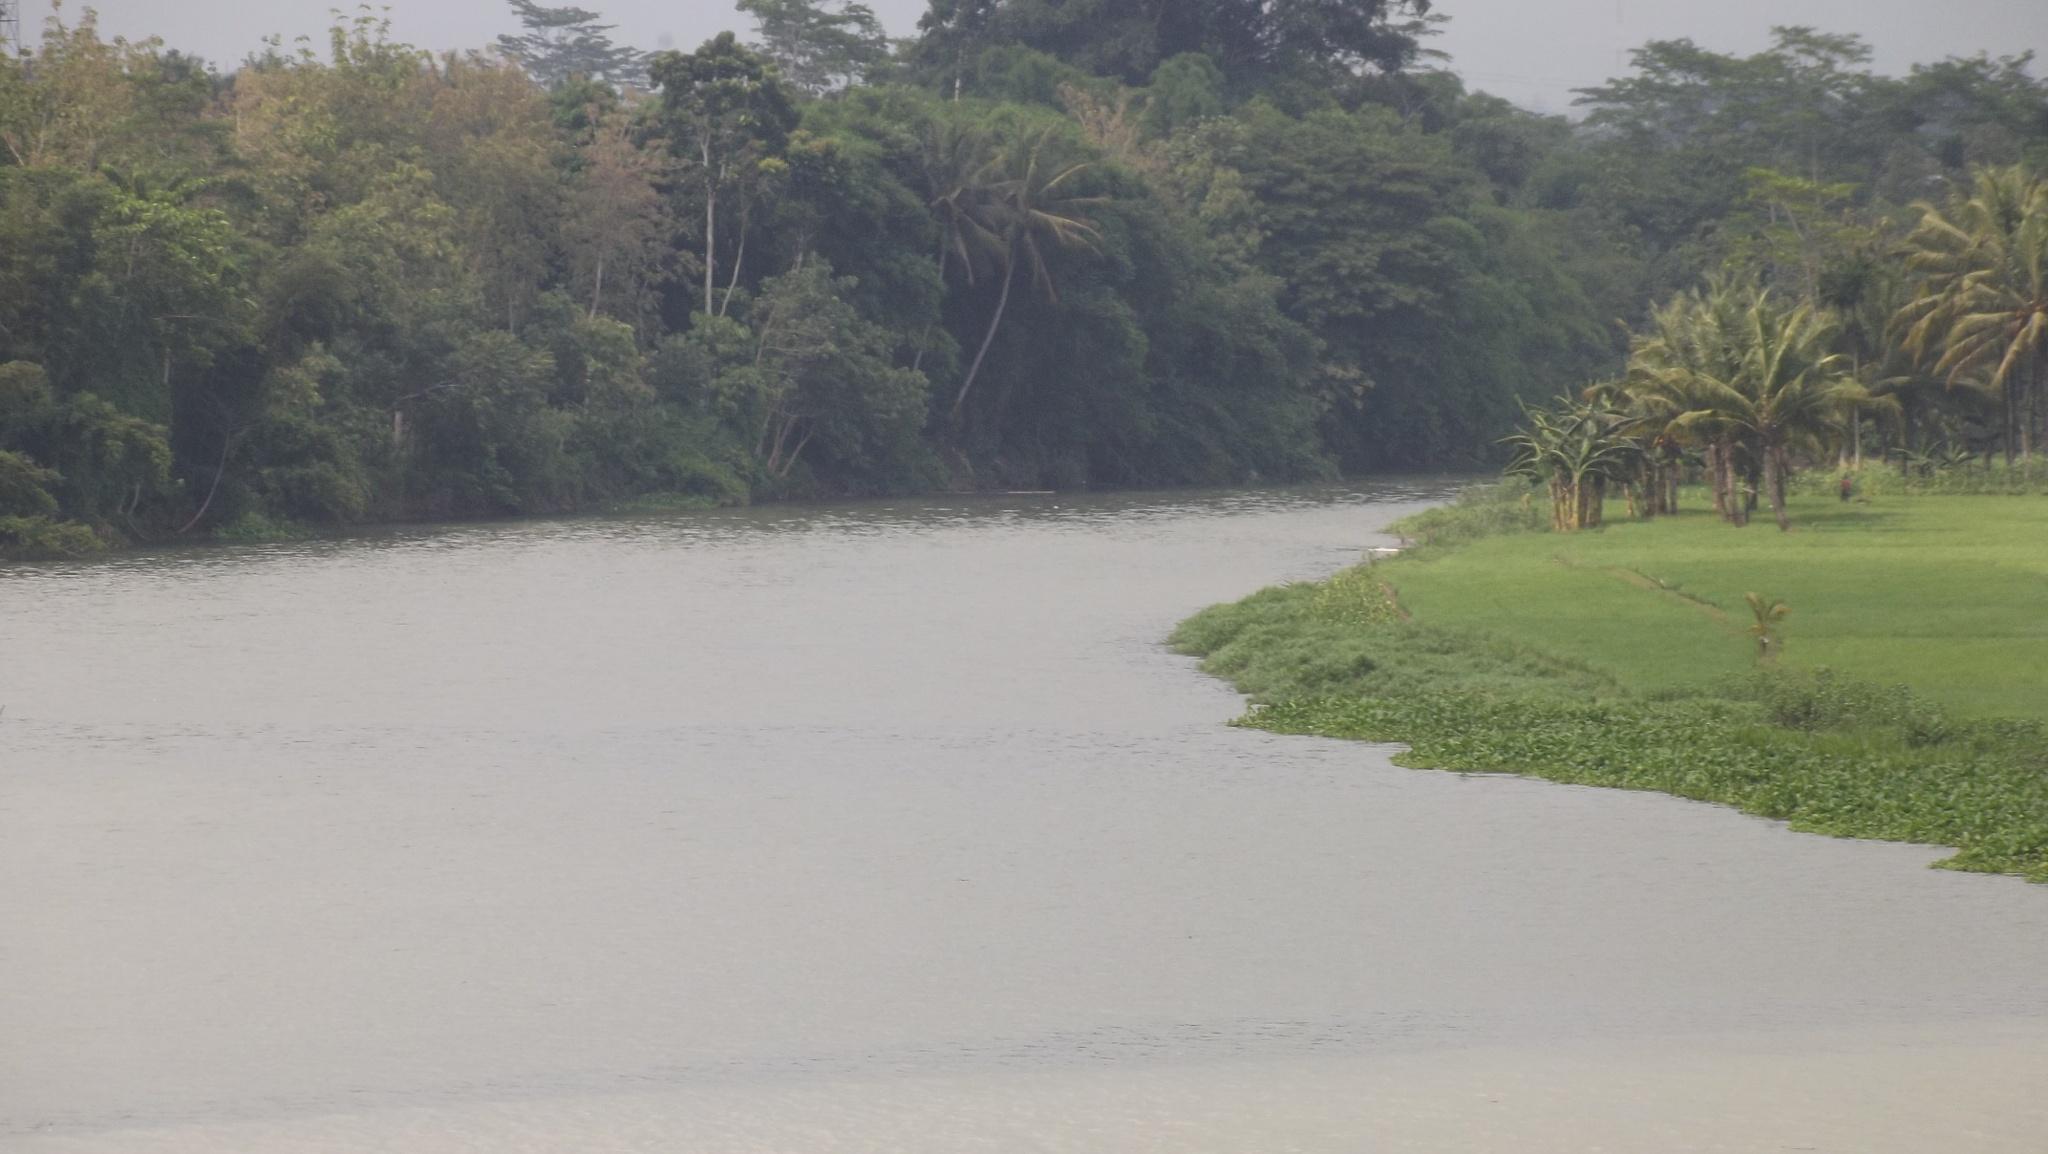 Wild river by Sari Handayani